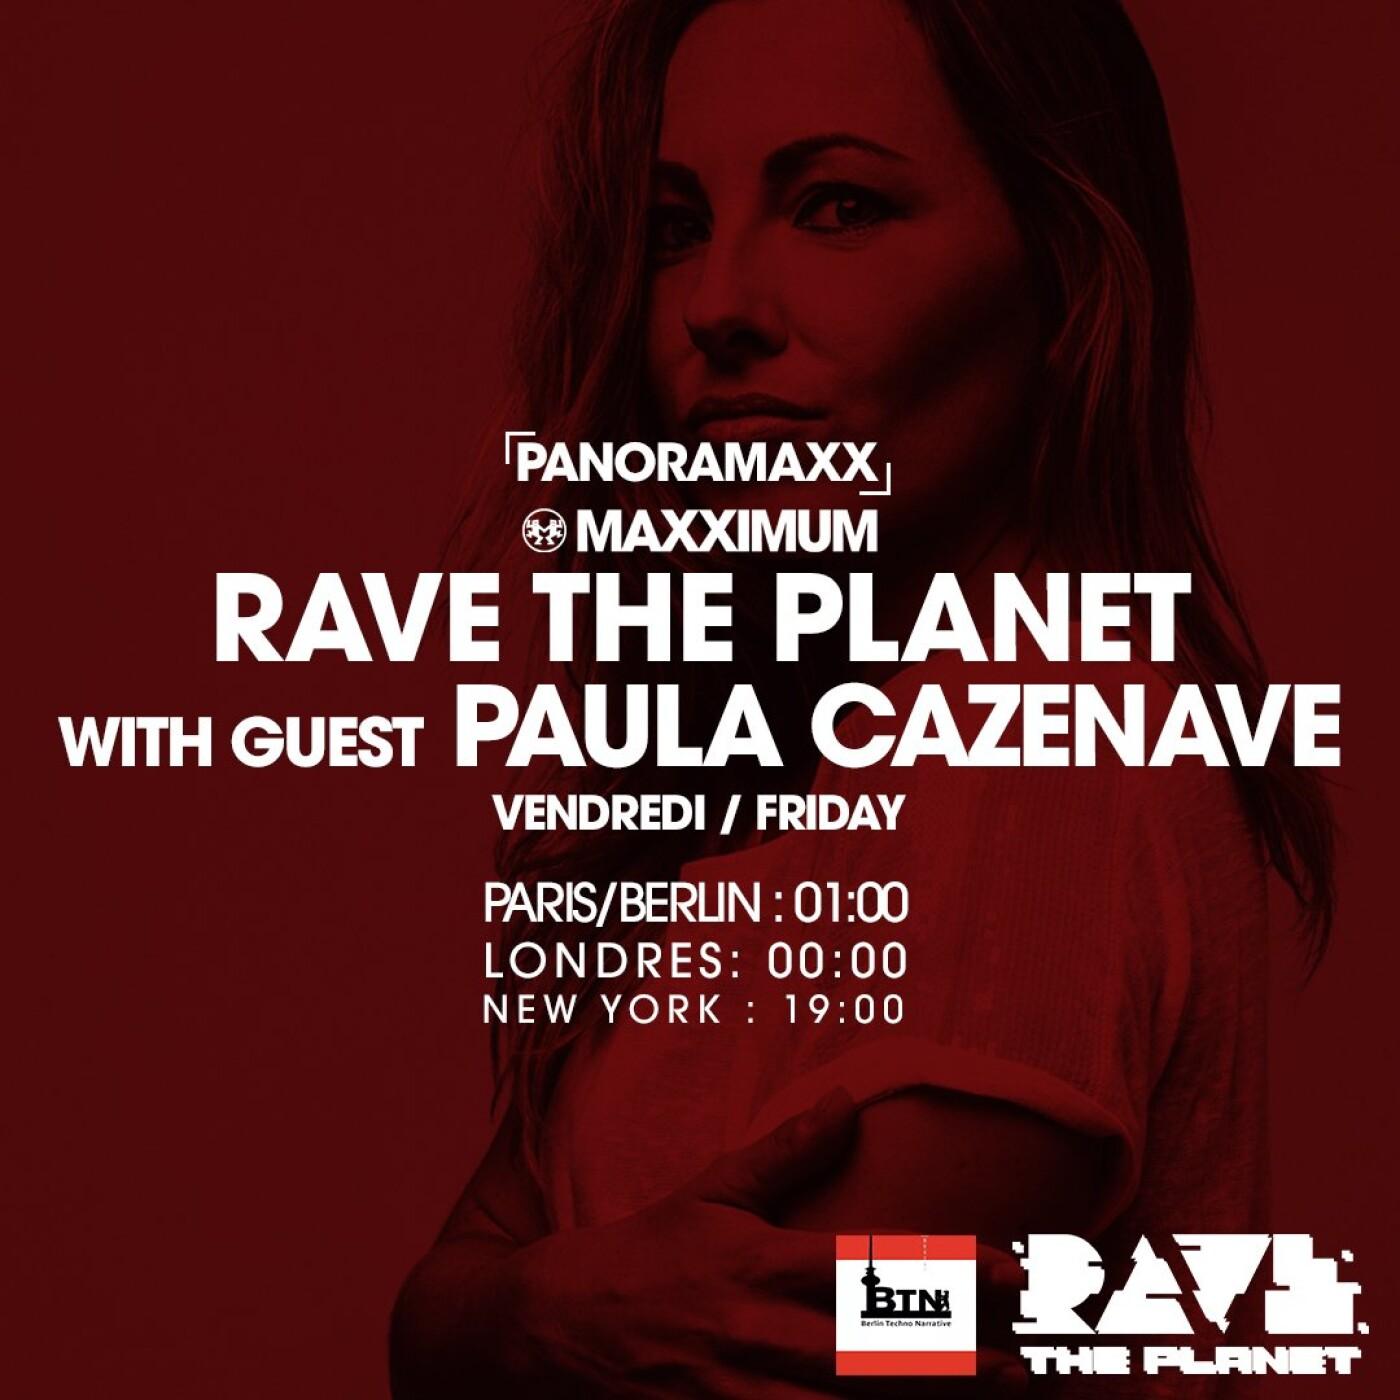 PANORAMAXX : RAVE THE PLANET INVITE PAULA CAZENAVE